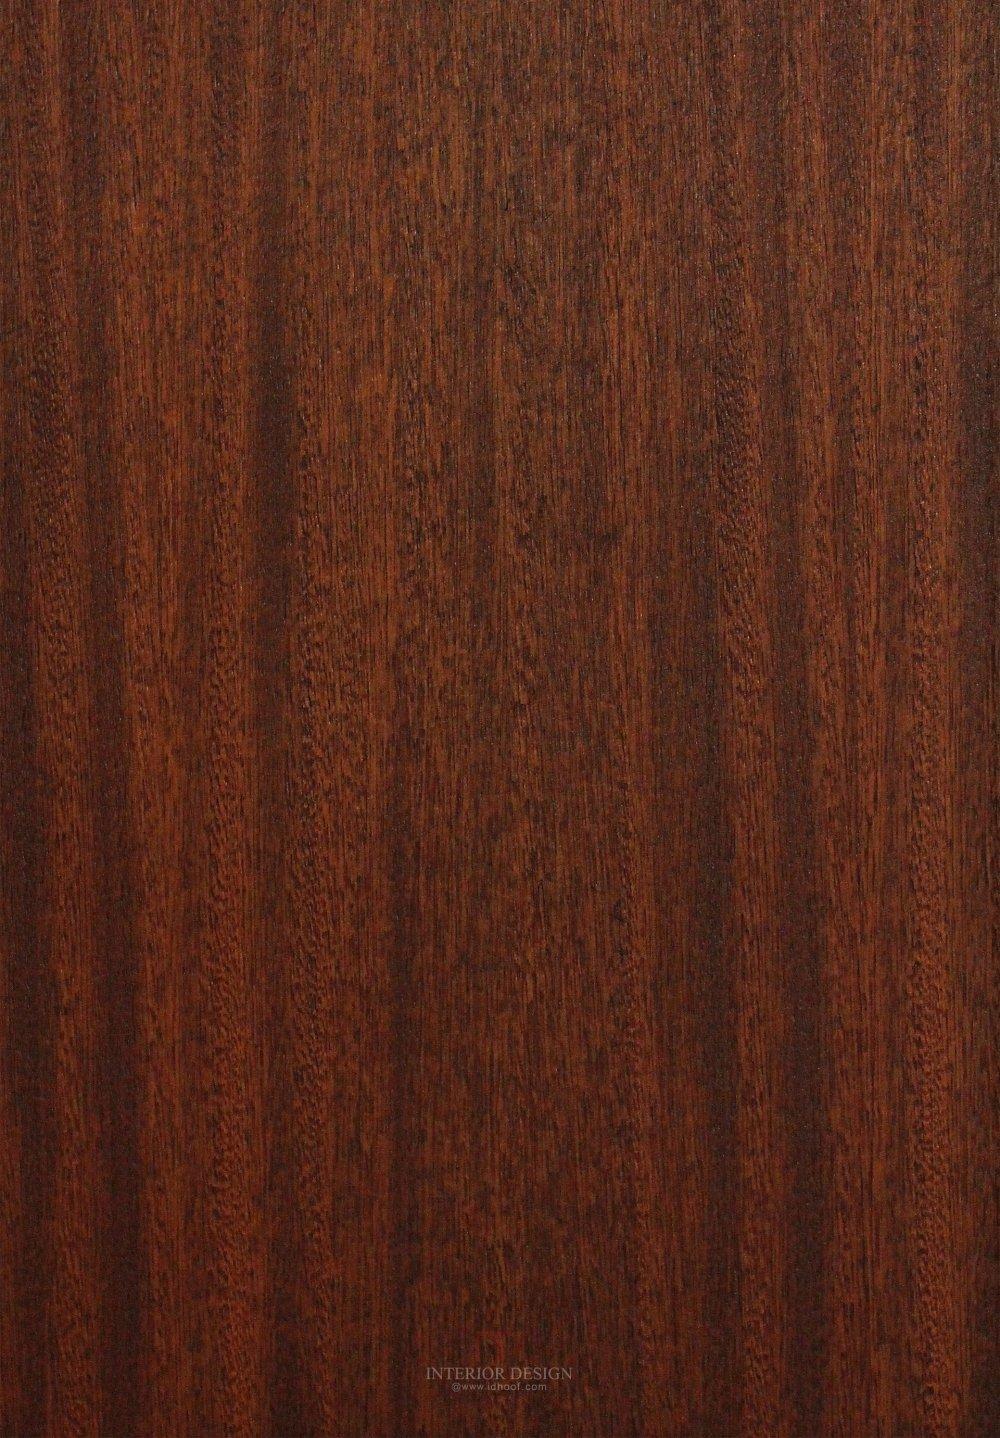 K6125AA_沙比利噴砂.jpg